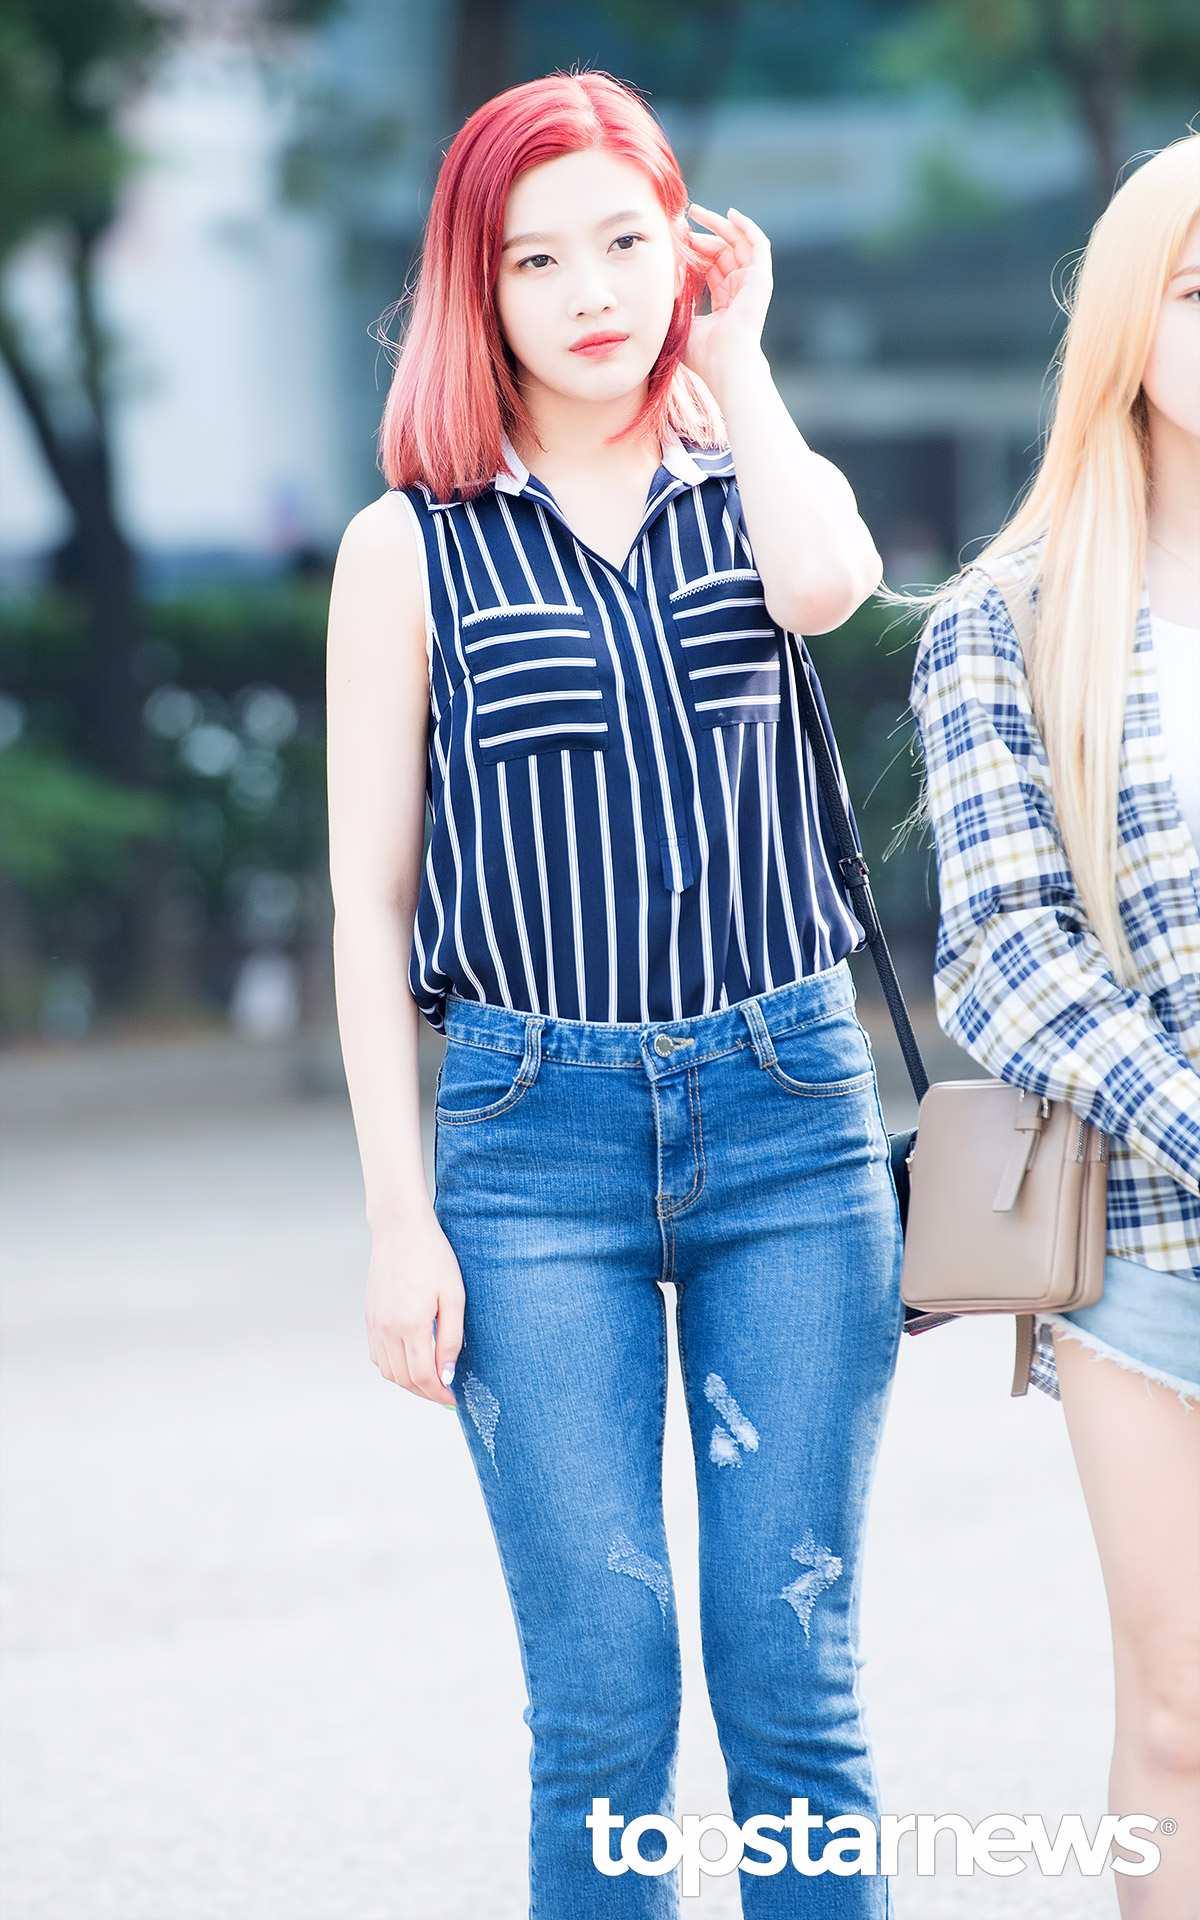 ◆Joy Joy真的瘦好多啊~~ 不過像這種無袖的襯衫, 肩寬或者有「蝴蝶袖」的女孩一定要慎選啊